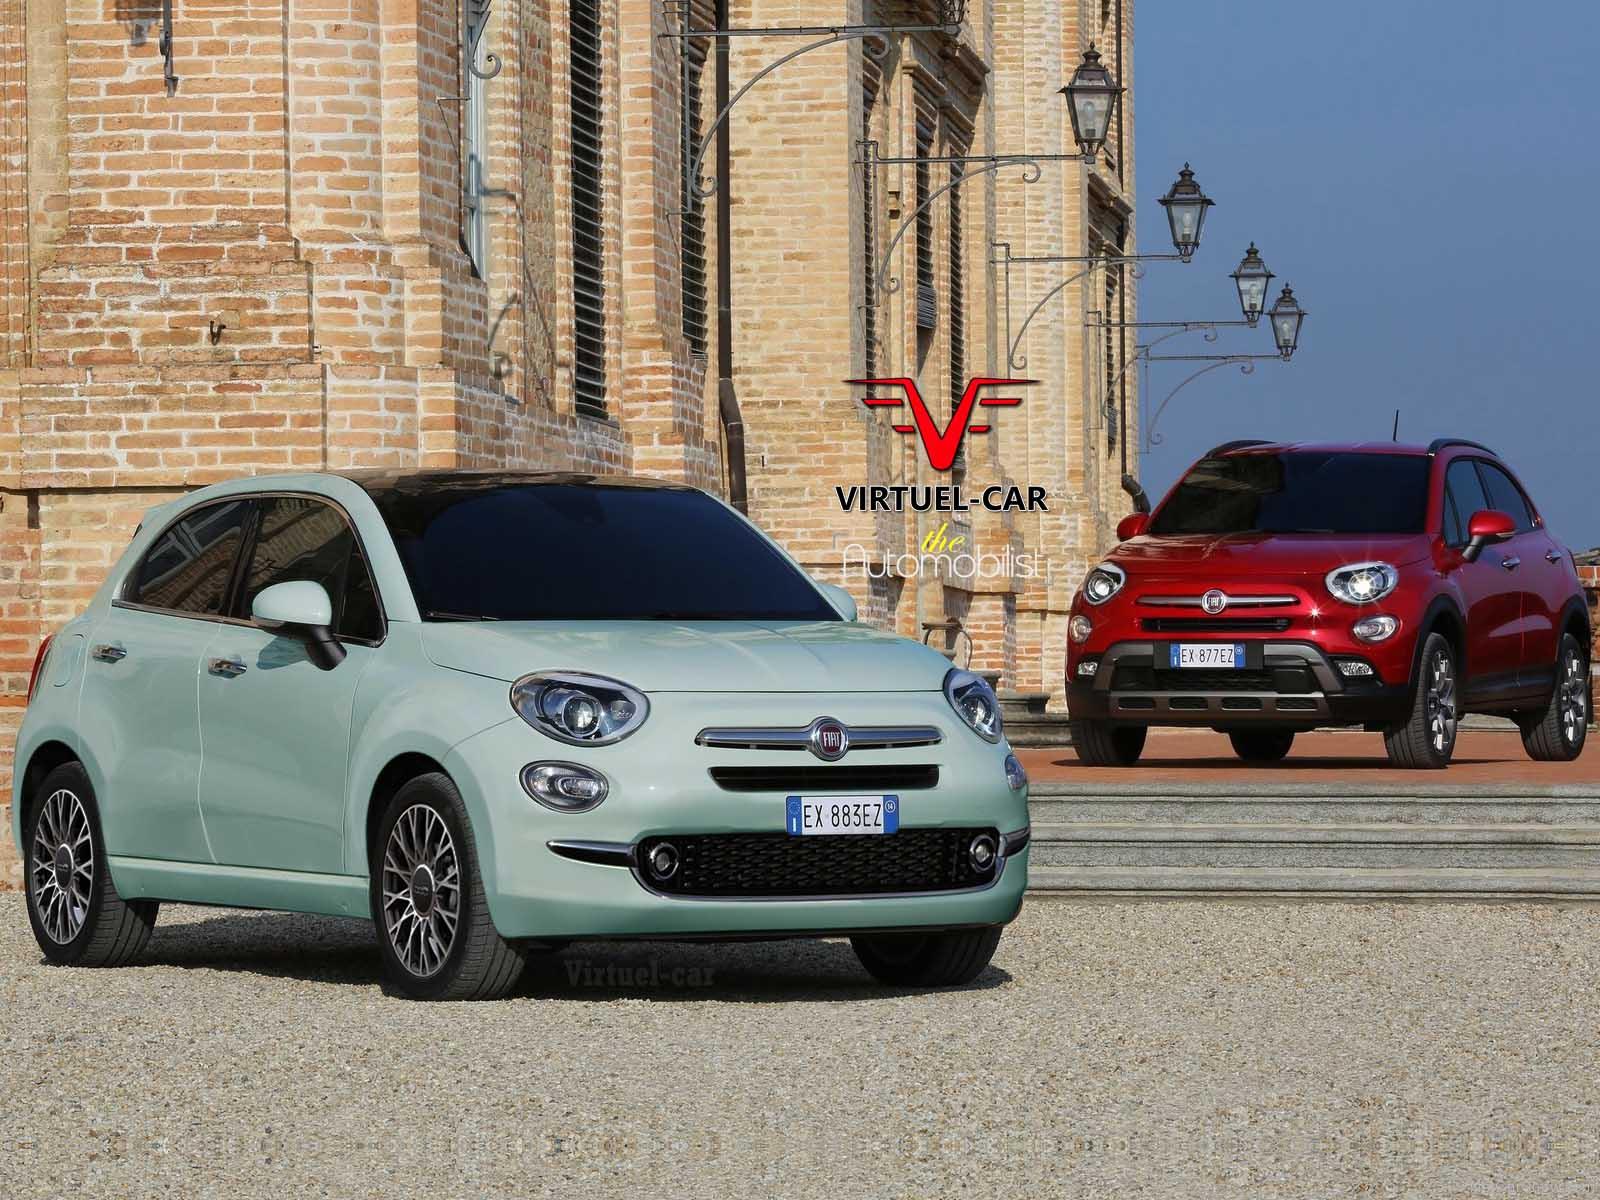 next-generation fiat 500 could get four-door version named 600